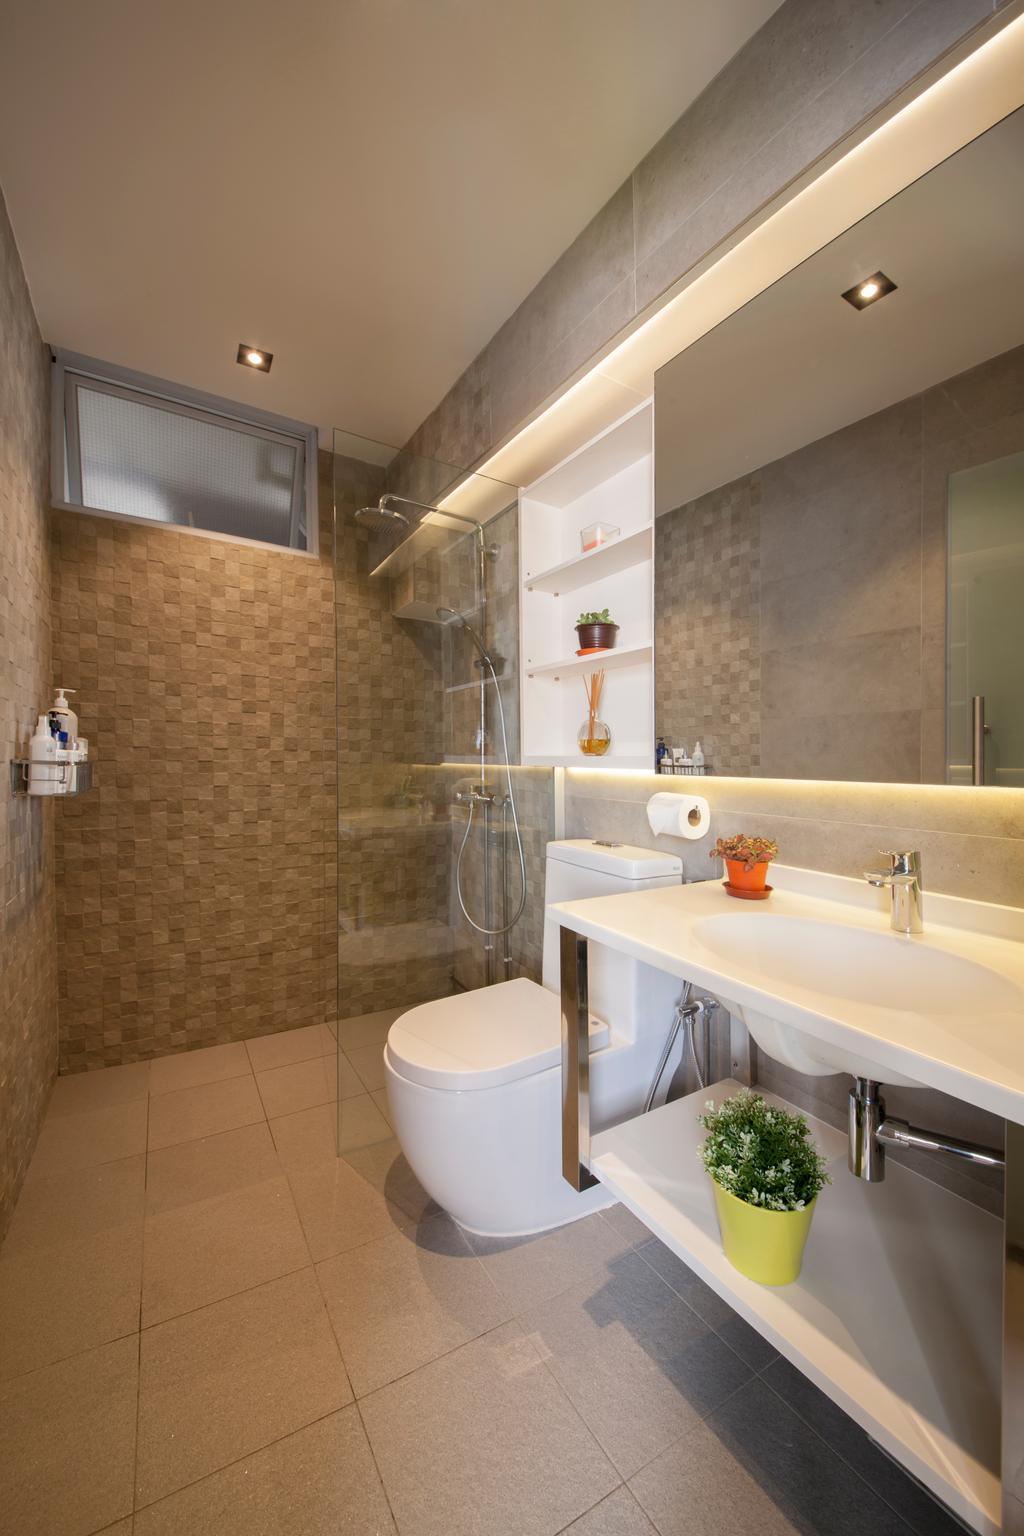 Transitional, HDB, Bathroom, Hougang, Interior Designer, Edge Interior, Tiles, Mosaic Tiles, Shower, Vanity Sink, Large Mirror, Sink, Indoors, Interior Design, Room, Building, Housing, Loft, Toilet